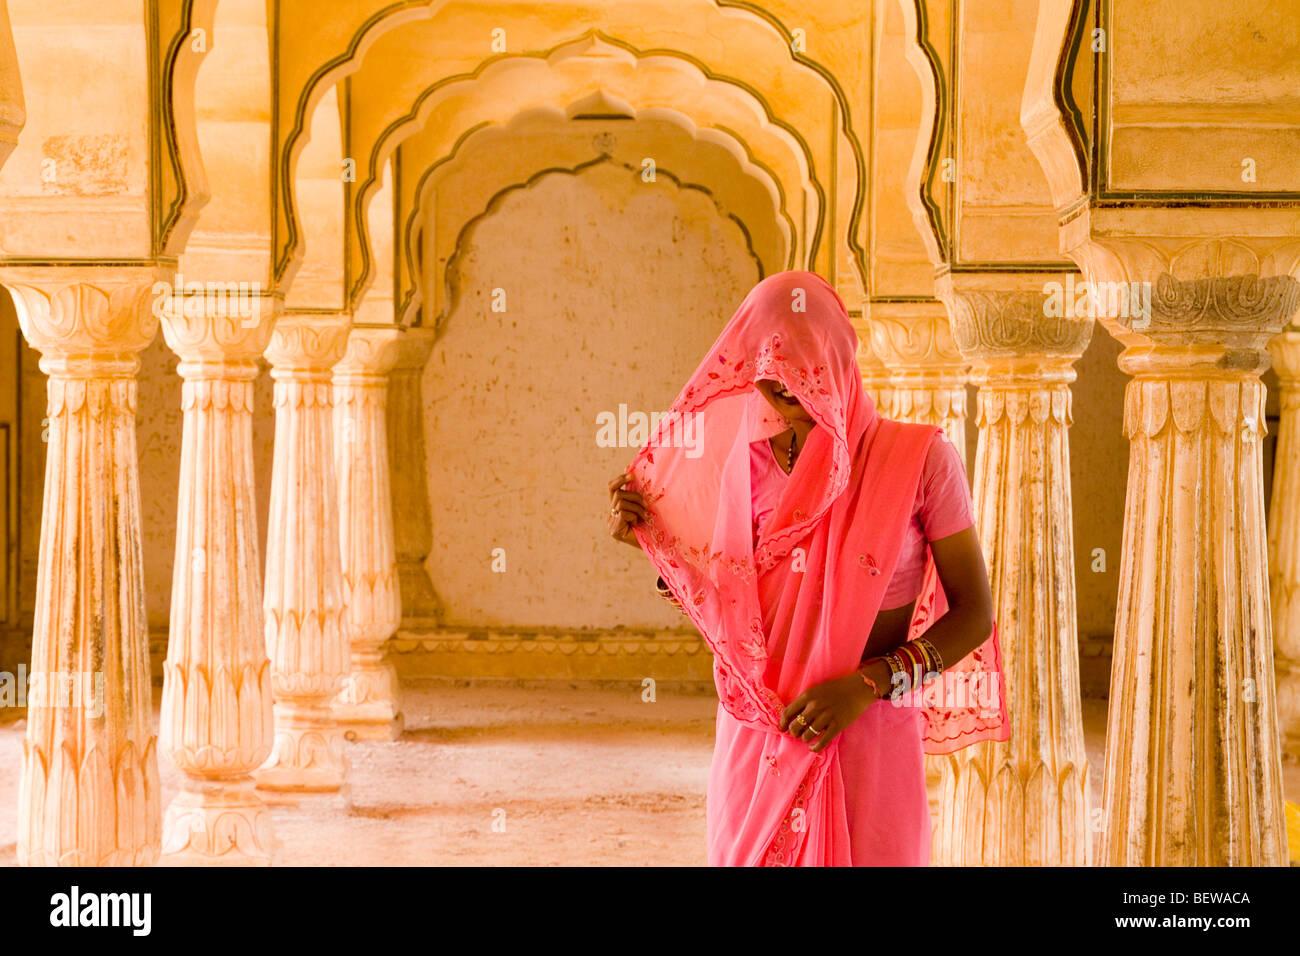 Femme voilée en Inde Photo Stock